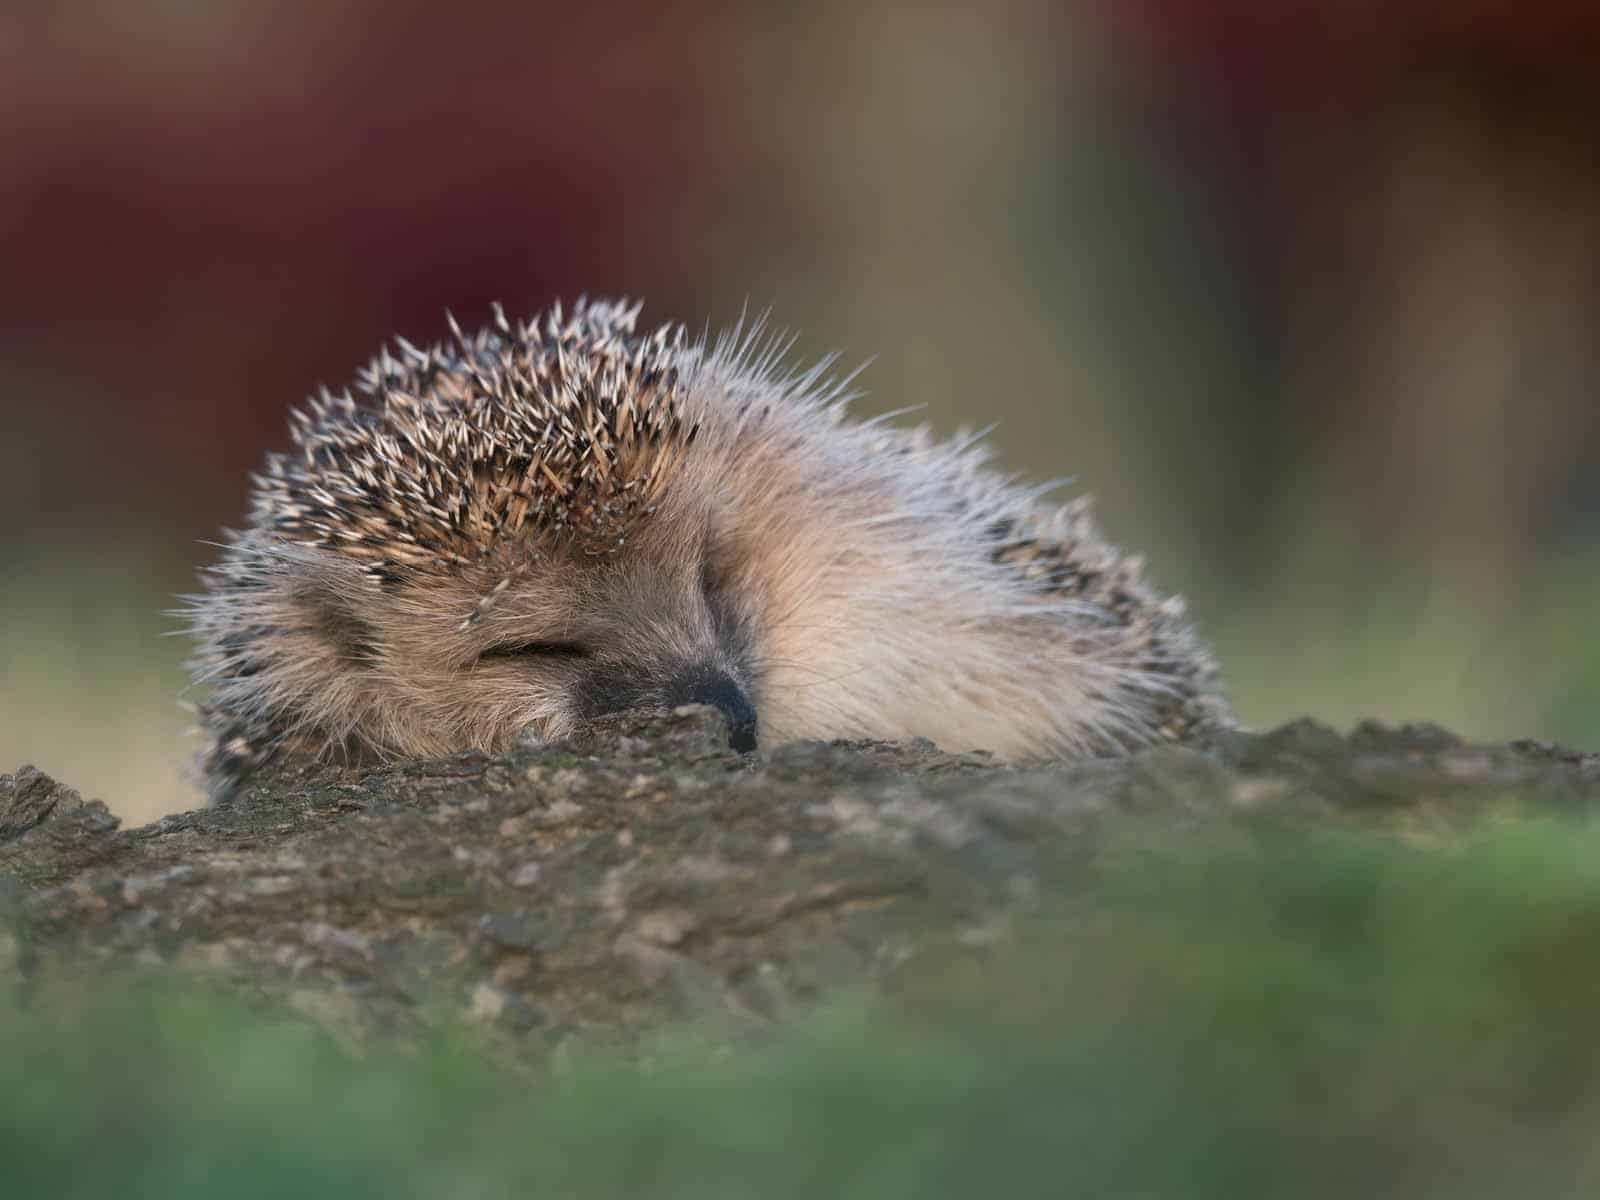 8 Hoglets a–sleeping